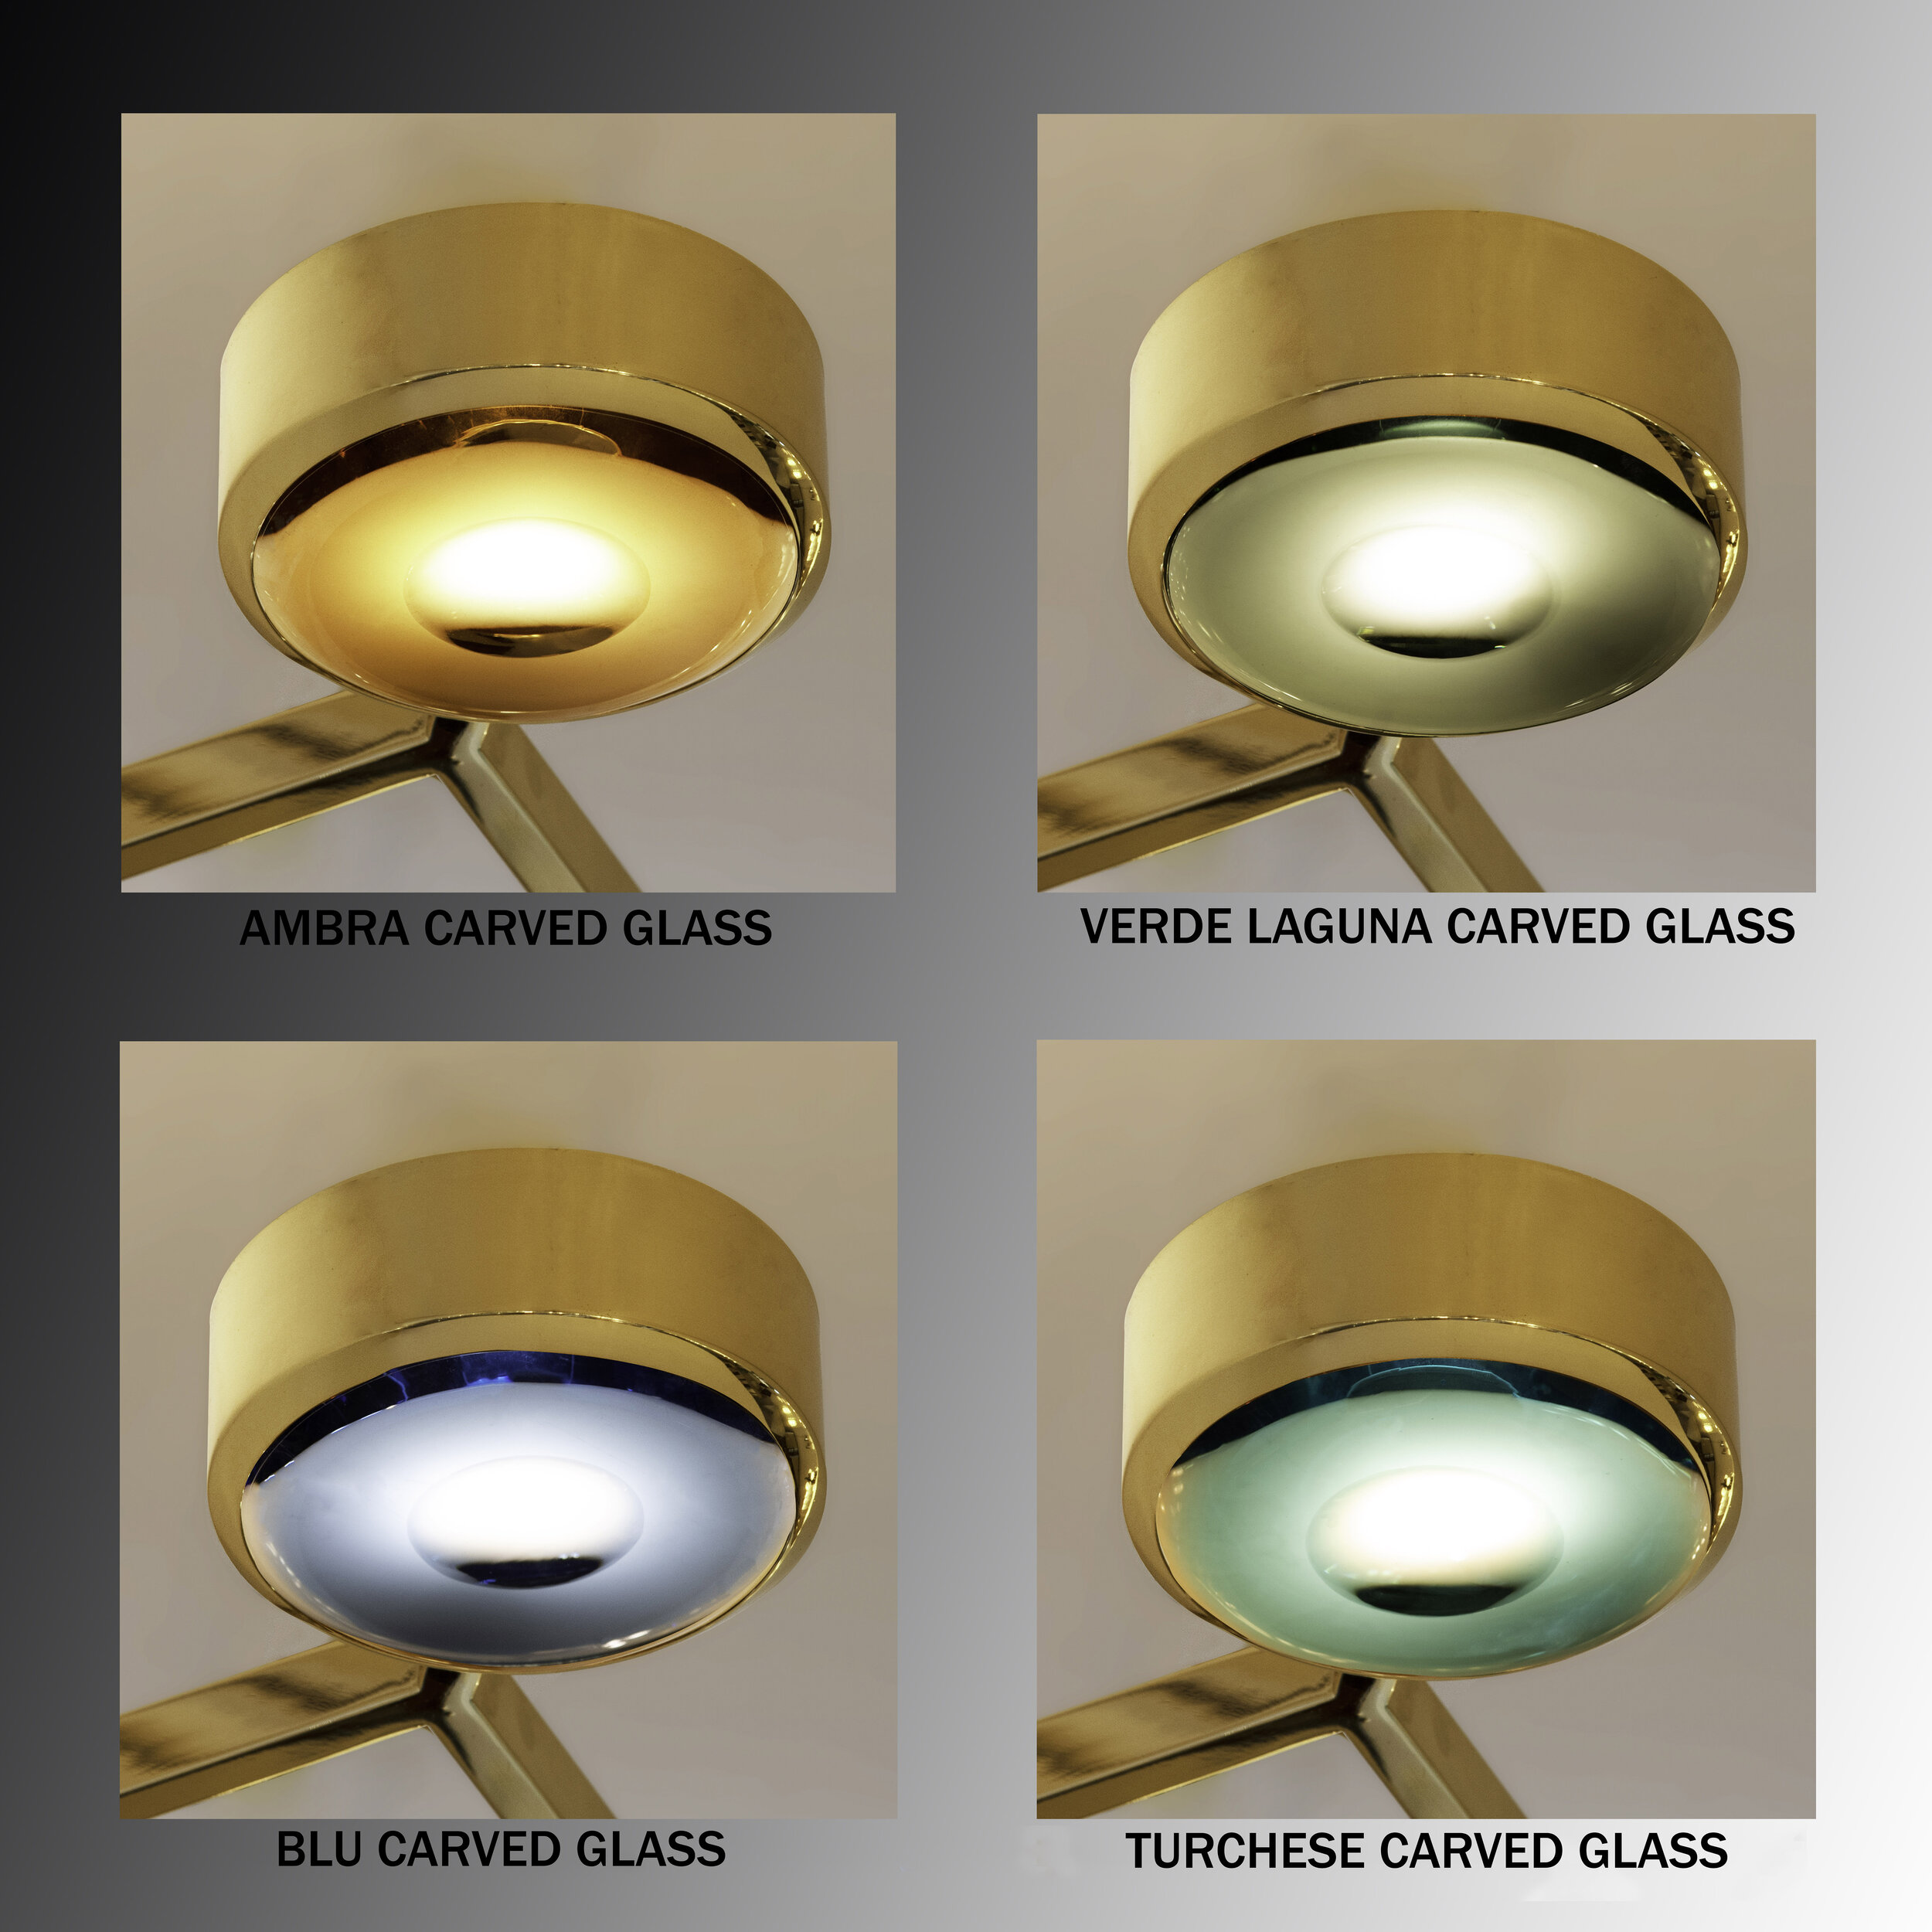 elemento modular ceiling light gaspare asaro italian modern italian mid century modern furniture and lighting new york ny